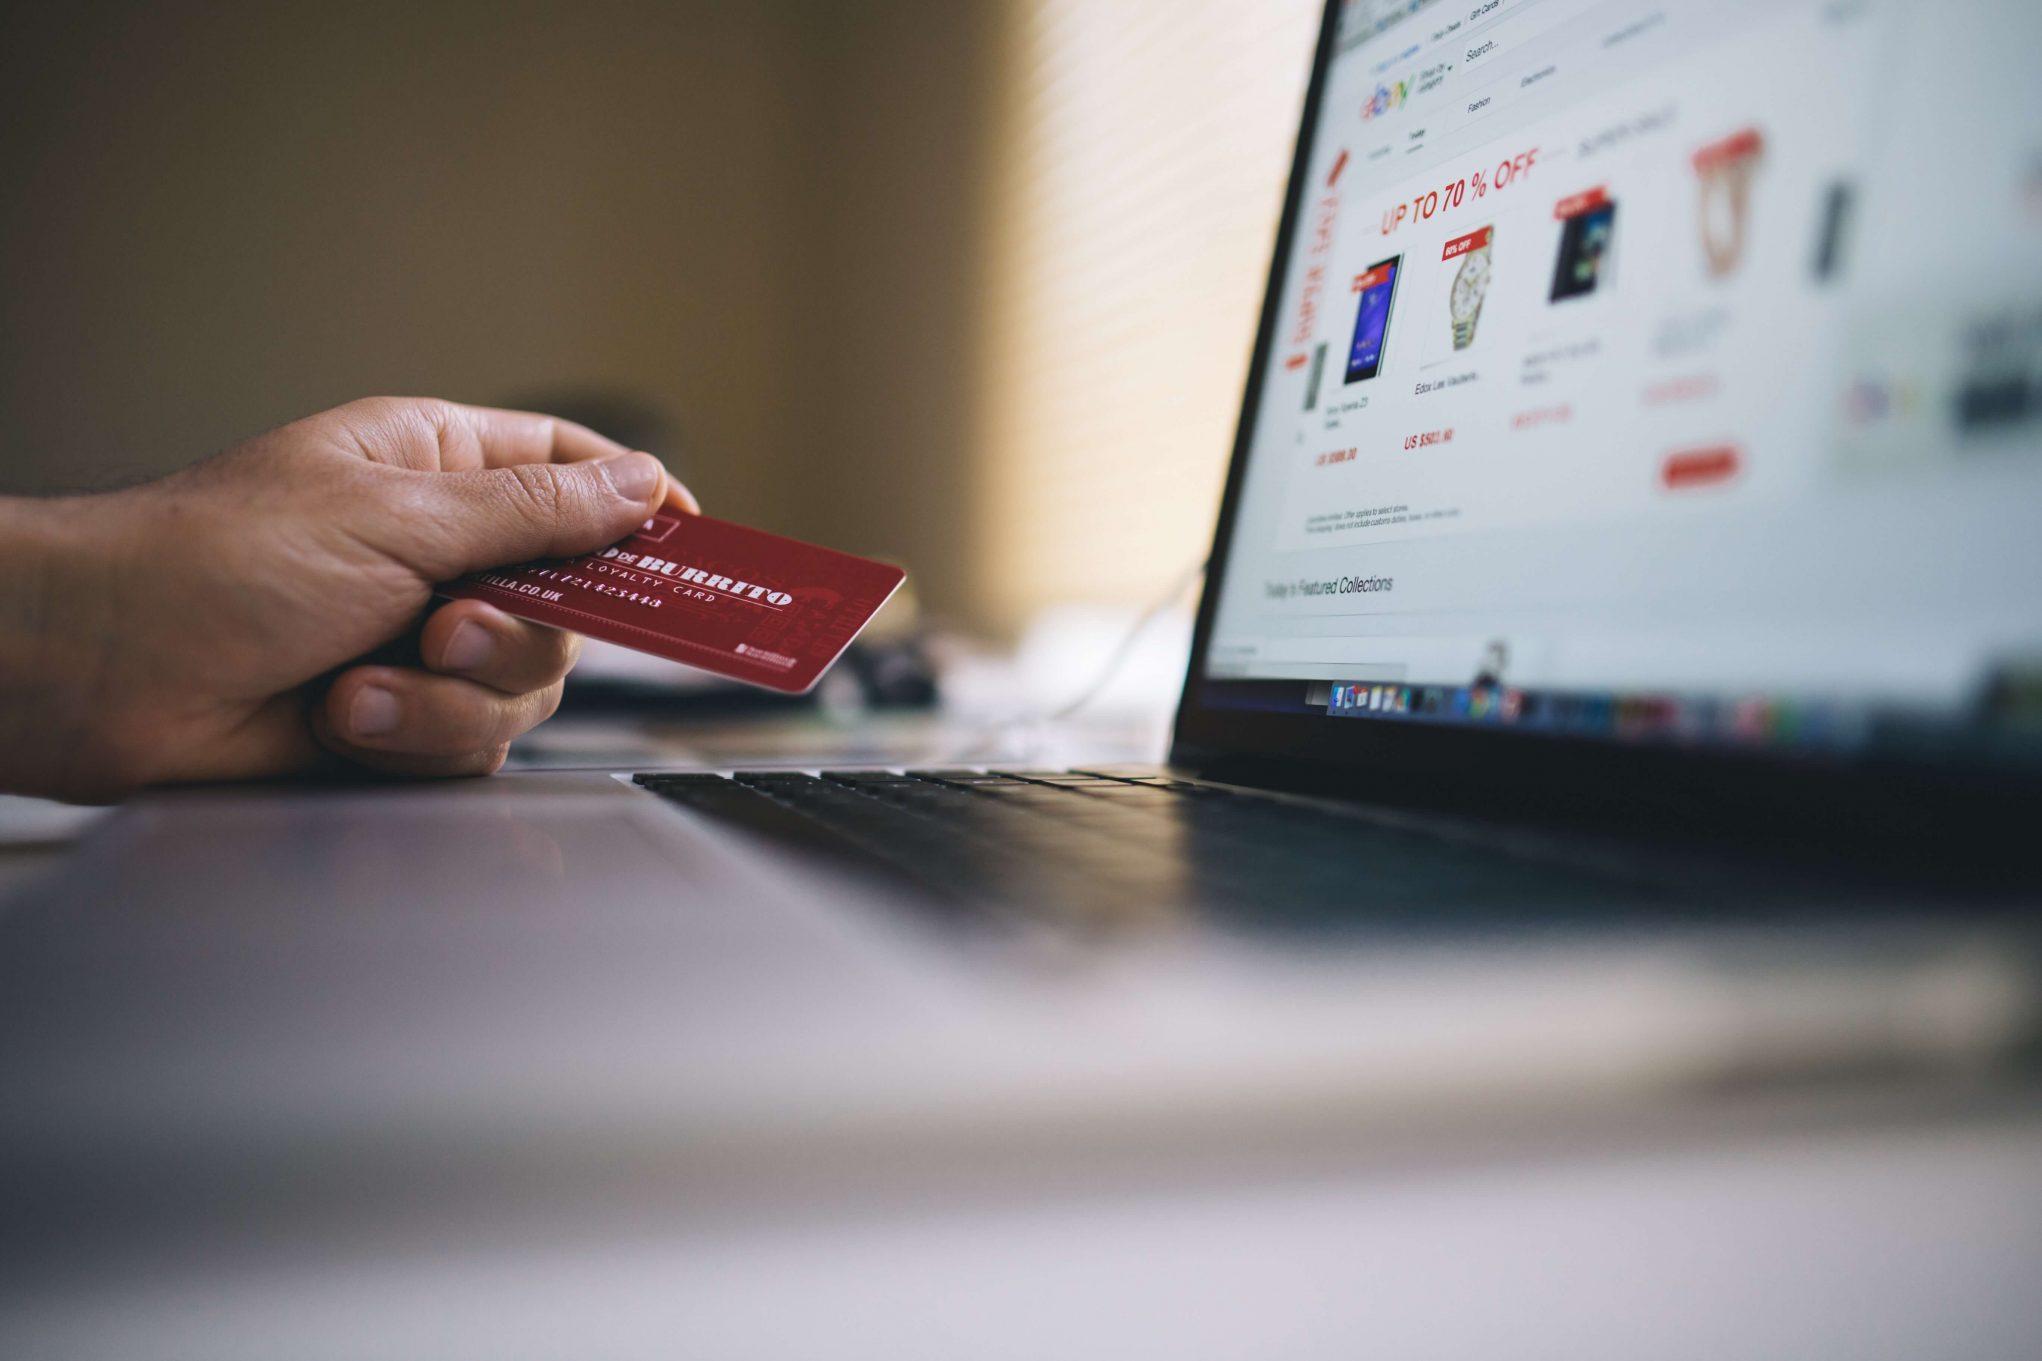 Seorang pria hendak membayar belanjaan yang dibelinya dari toko online ketika harbolnas